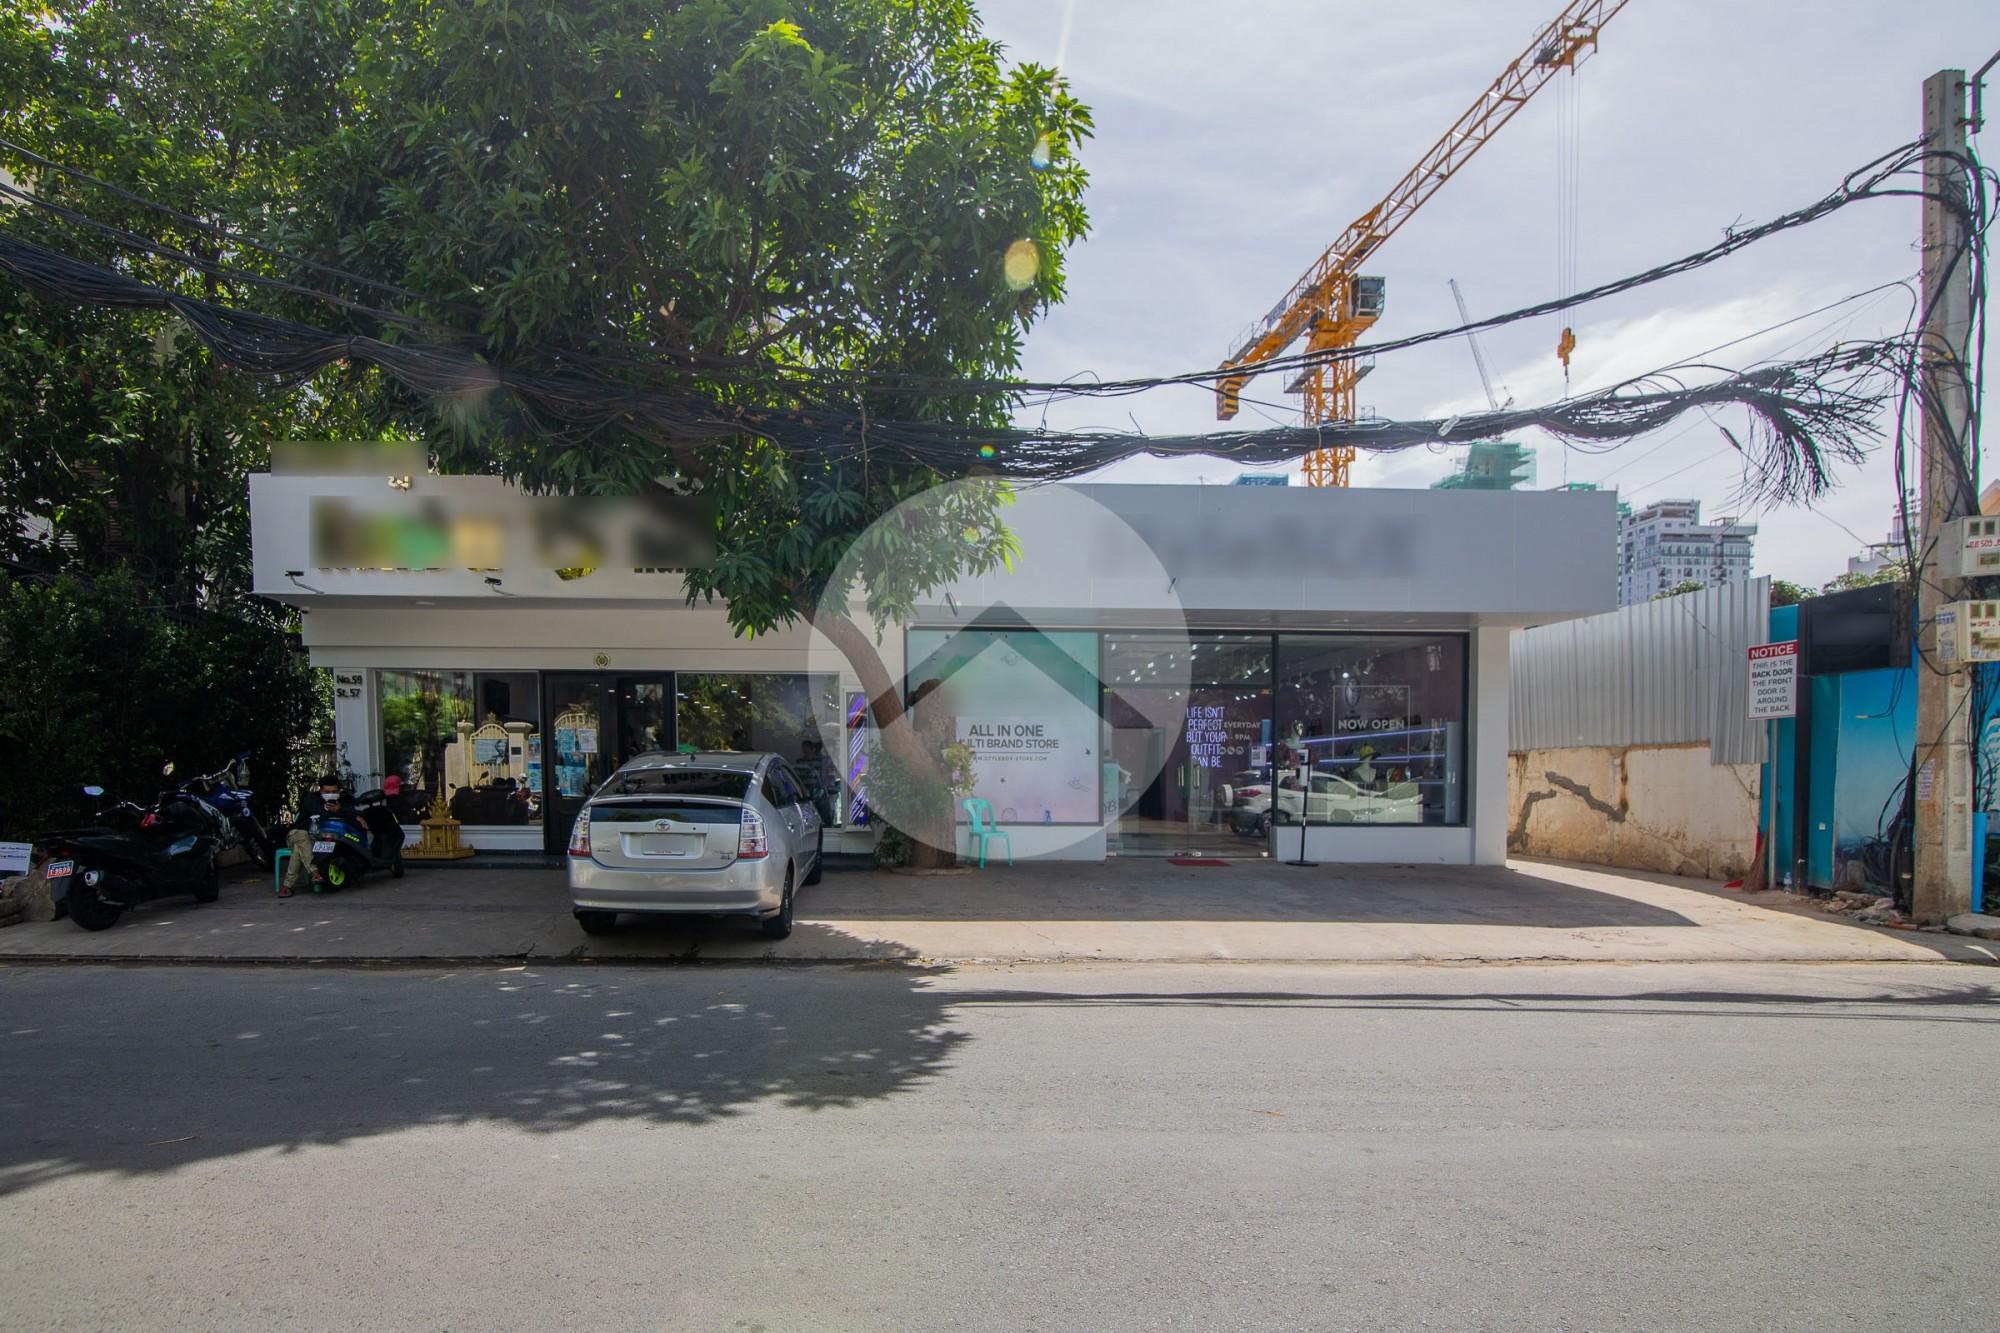 80 Sqm Commercial Space For Rent - BKK1, Phnom Penh